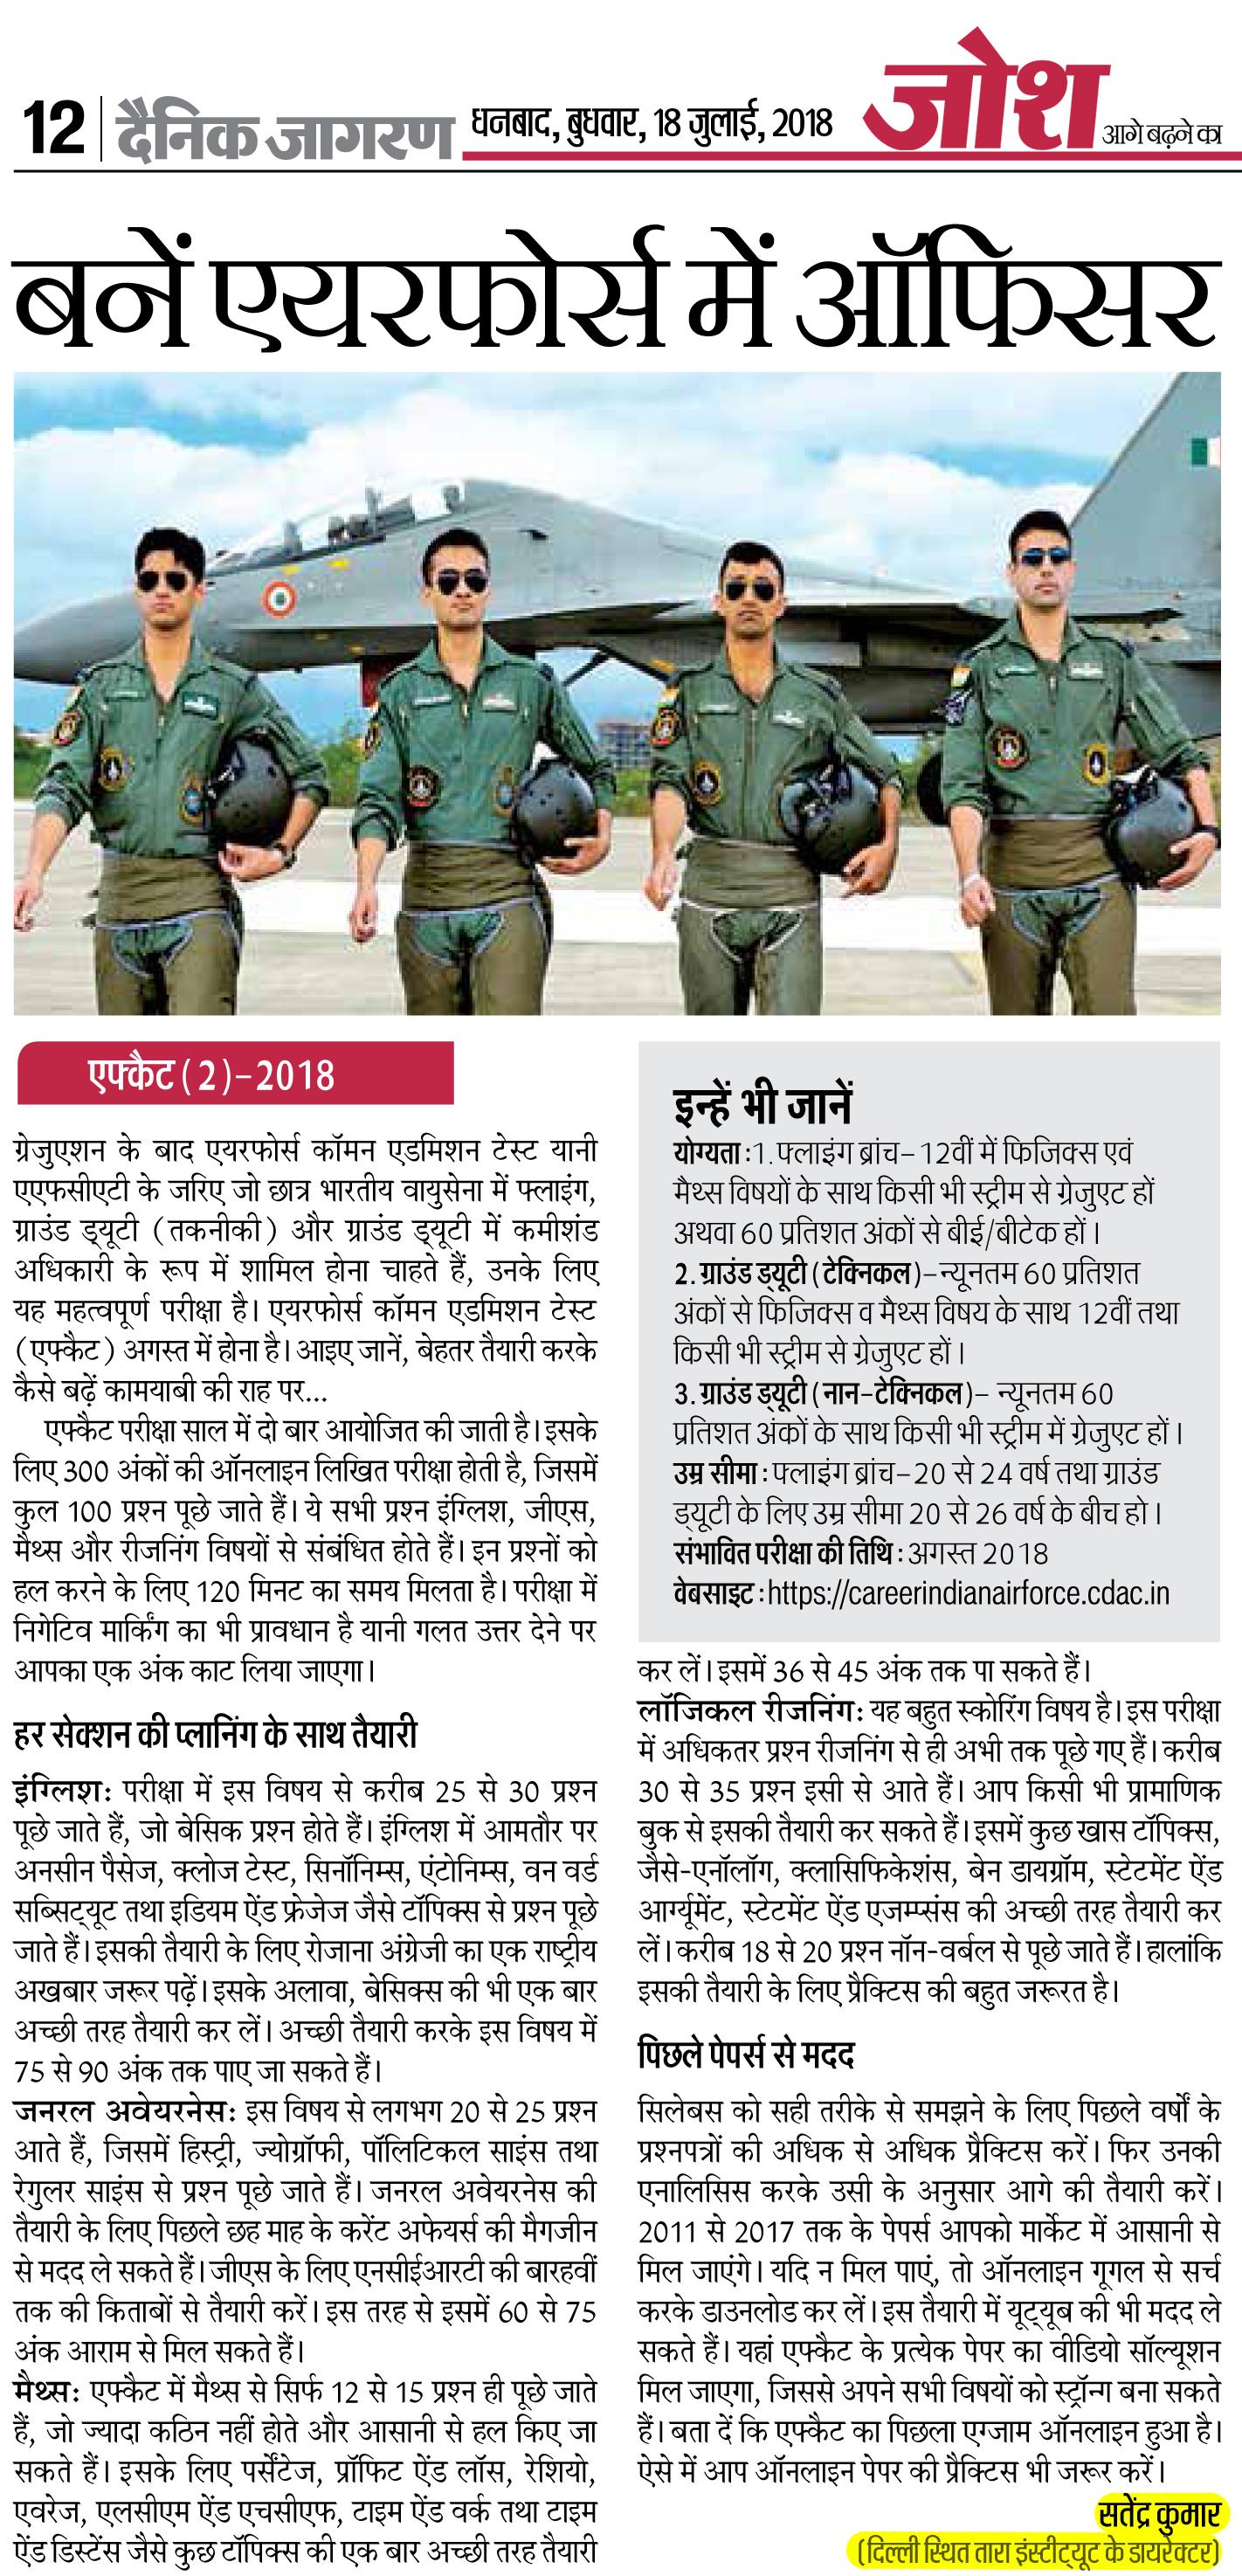 AFCAT-2-2018-Dainik-Jagran-18th-july-2018